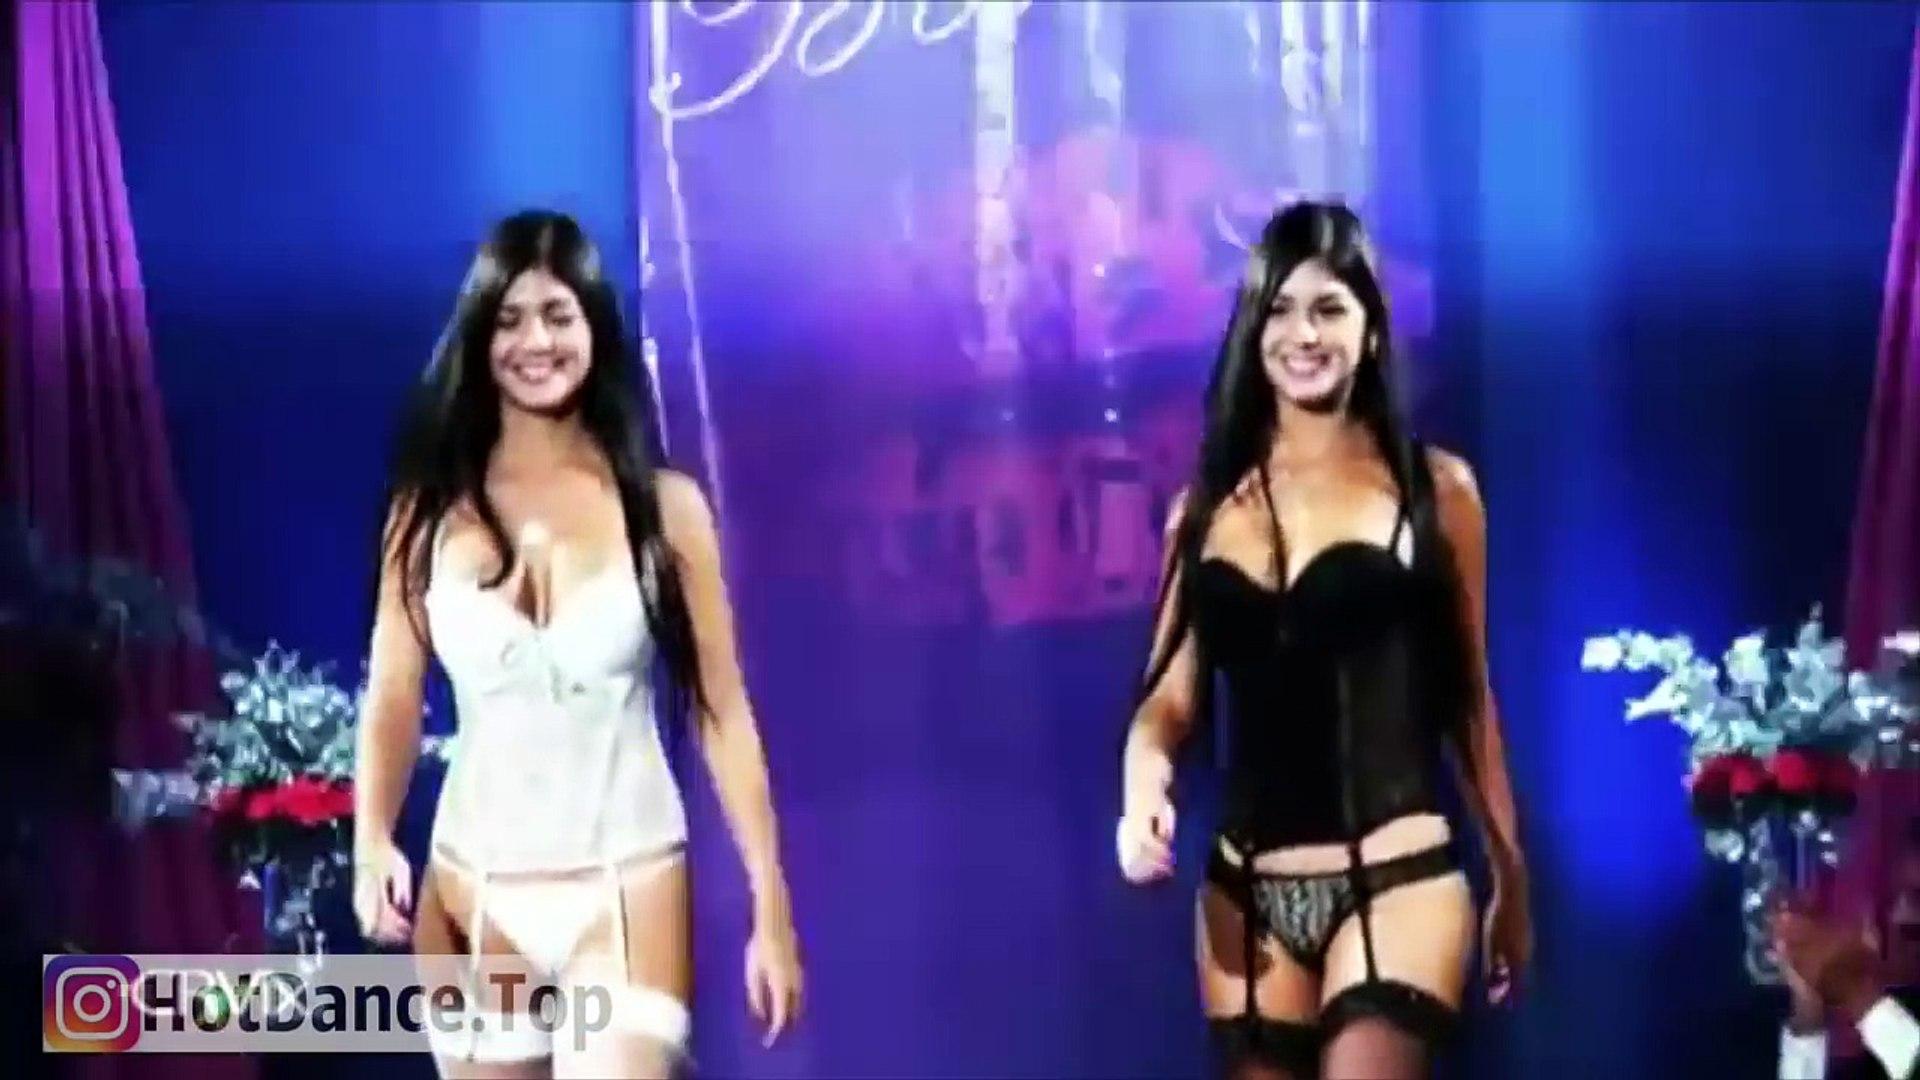 The Devil and Maria dAvalos